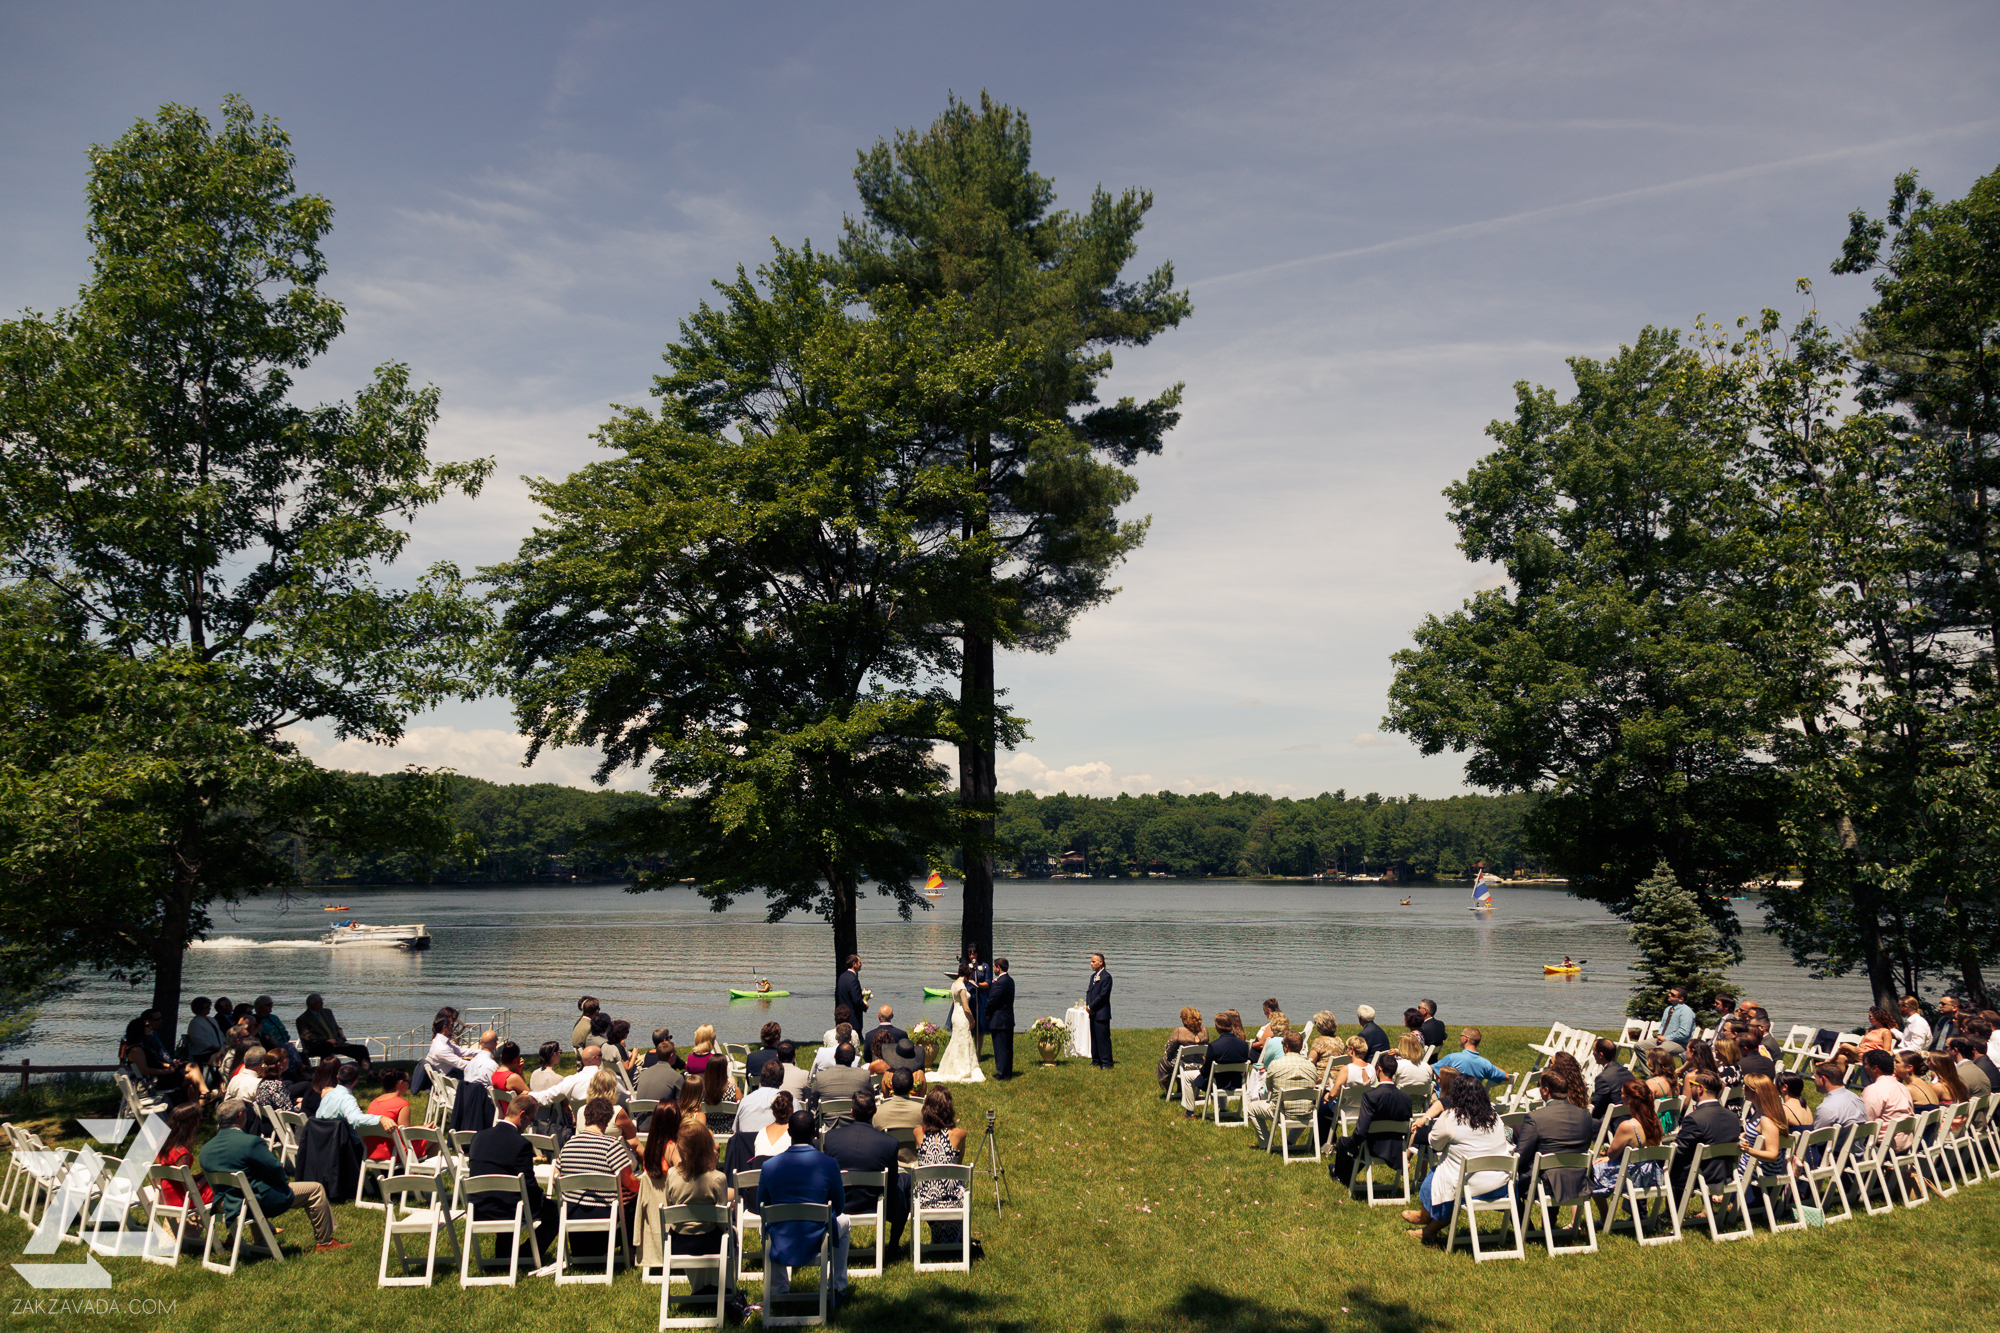 scranton-wedding-photography-zak-zavada-ruddyBelcastroWedding-268.jpg